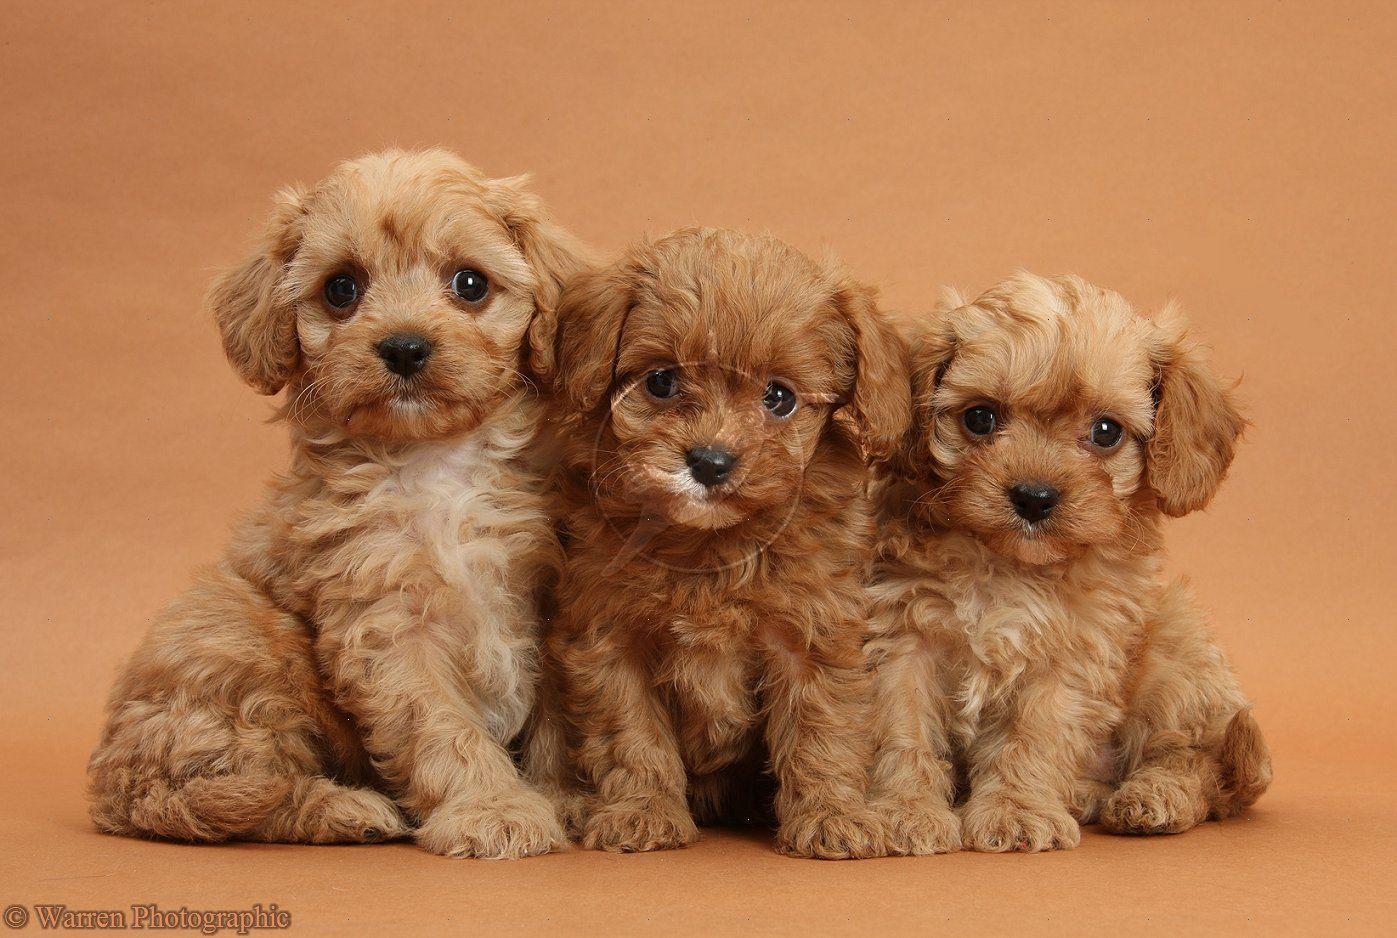 ThreeCavapoopups,just for you x Cavapoo puppies